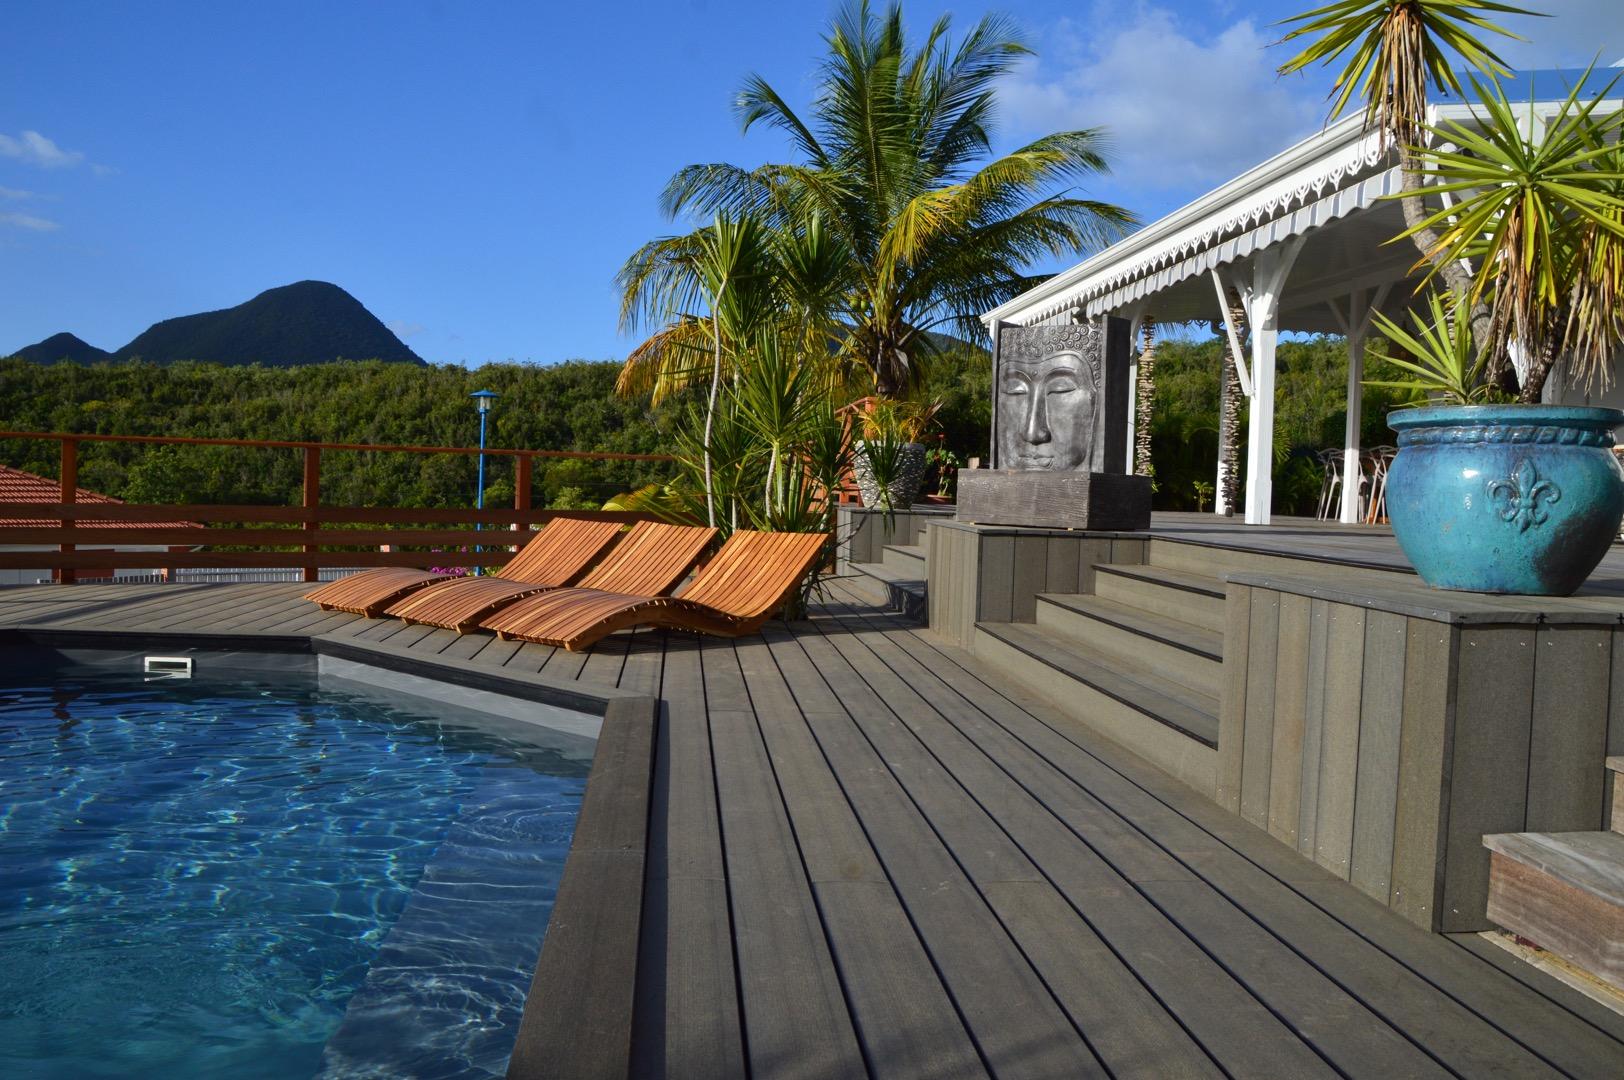 Location Villa Martinique Le Diamant Avec Piscine Prive Et